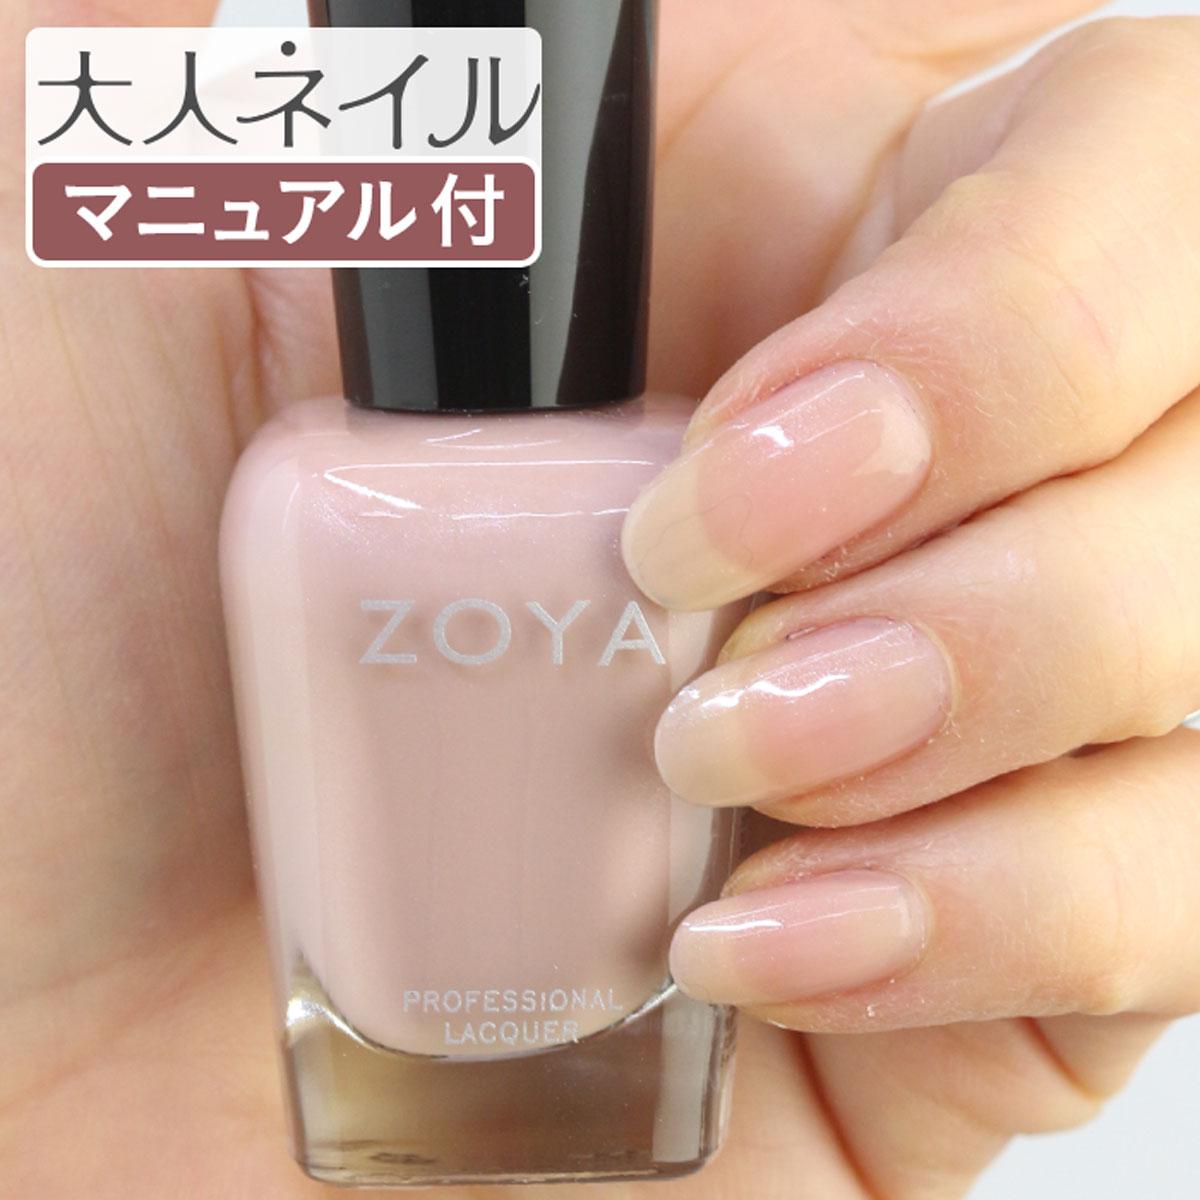 ZOYA ゾーヤ ゾヤ ネイルカラー ZP351 15mL SALLY サリー 自爪 の為に作られた ネイル にやさしい 自然派 マニキュア zoya セルフネイル にもおすすめ トップ10 人気色 ピンク シアー パール オフィス